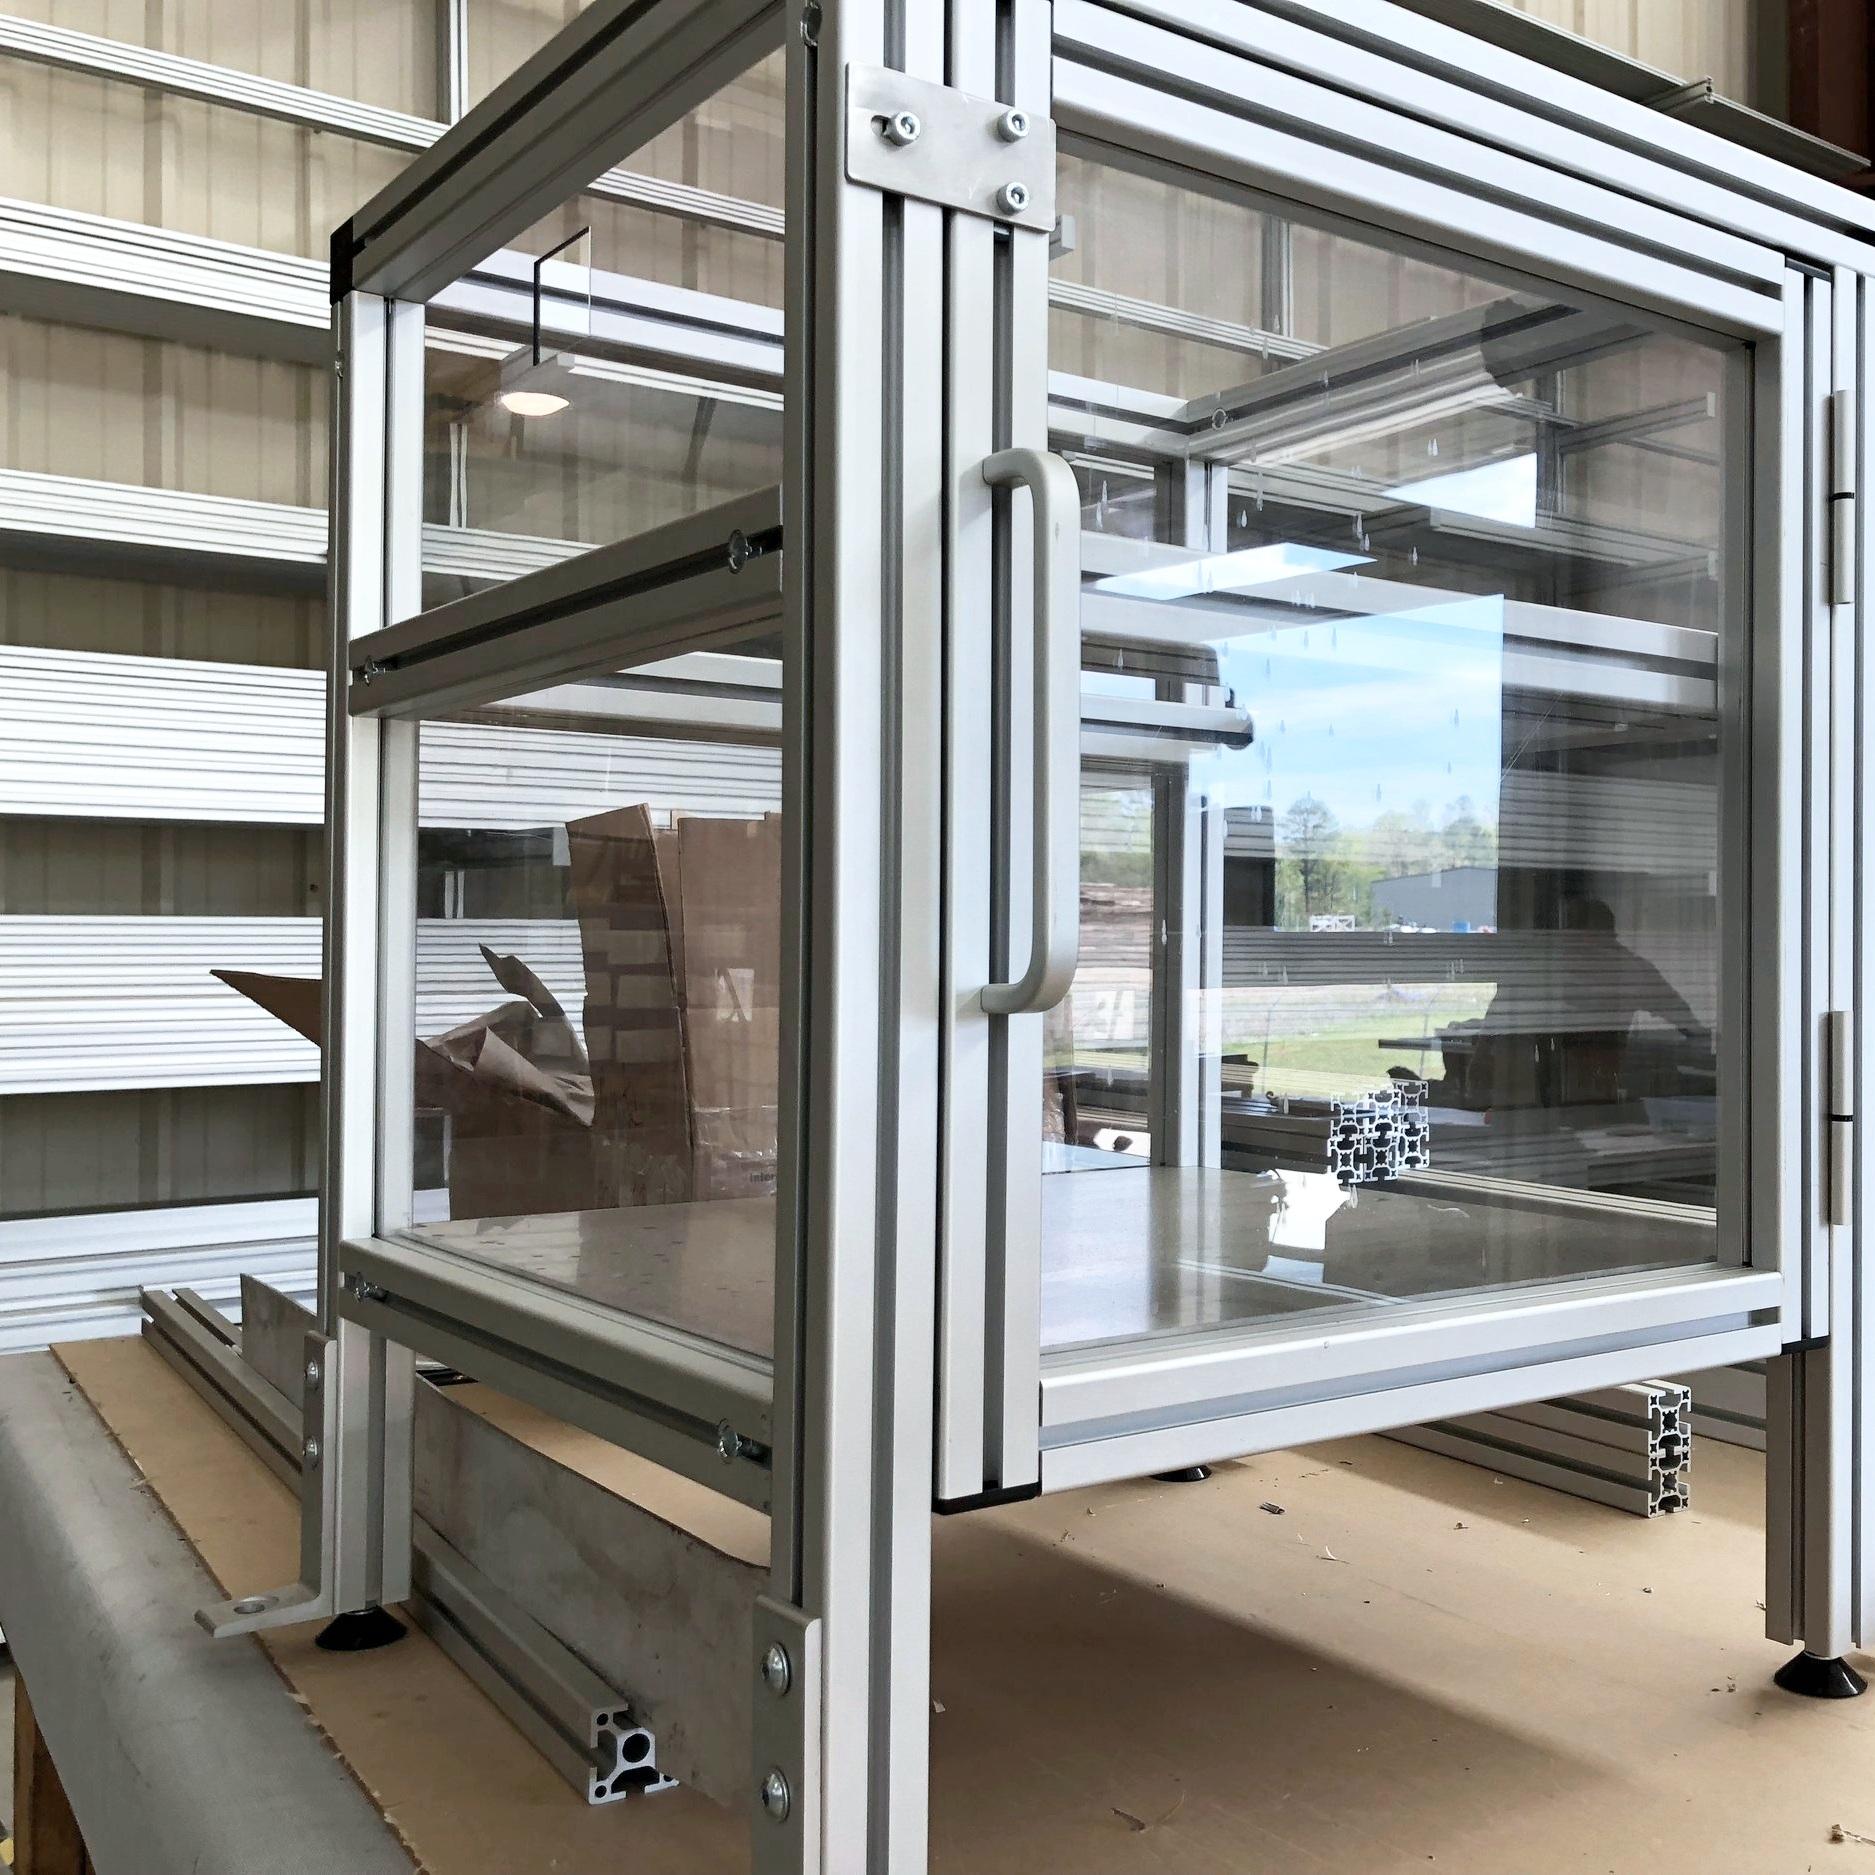 MayTec-cabinet_Fitz-Thors-Engineering_MayTec-Distributor_Birmingham-AL.jpg